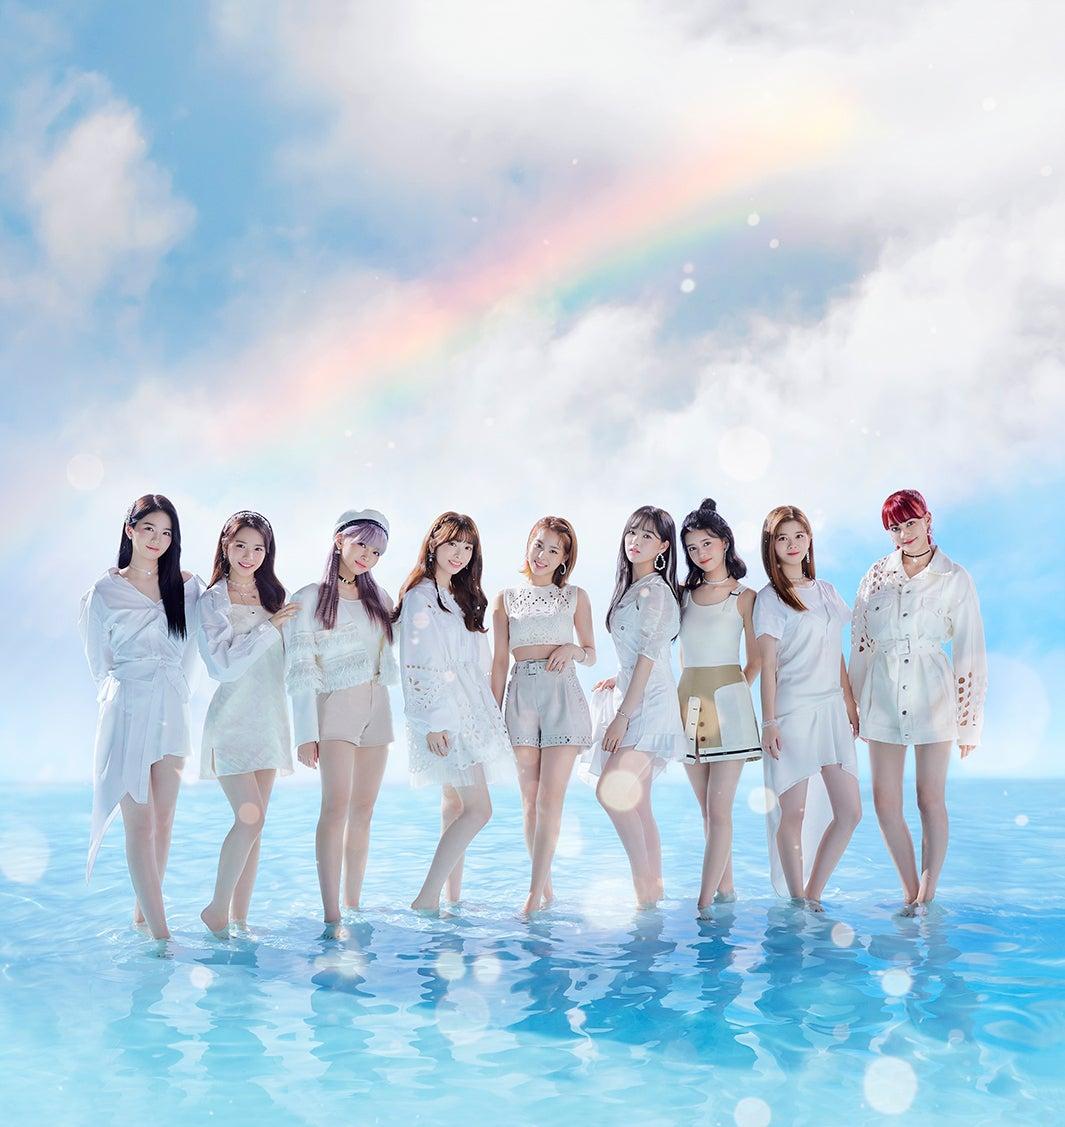 NiziU、12月2日にデビューシングル「Step and a step」発表 J.Y.Park書き下ろし<MAKOコメント> - モデルプレス